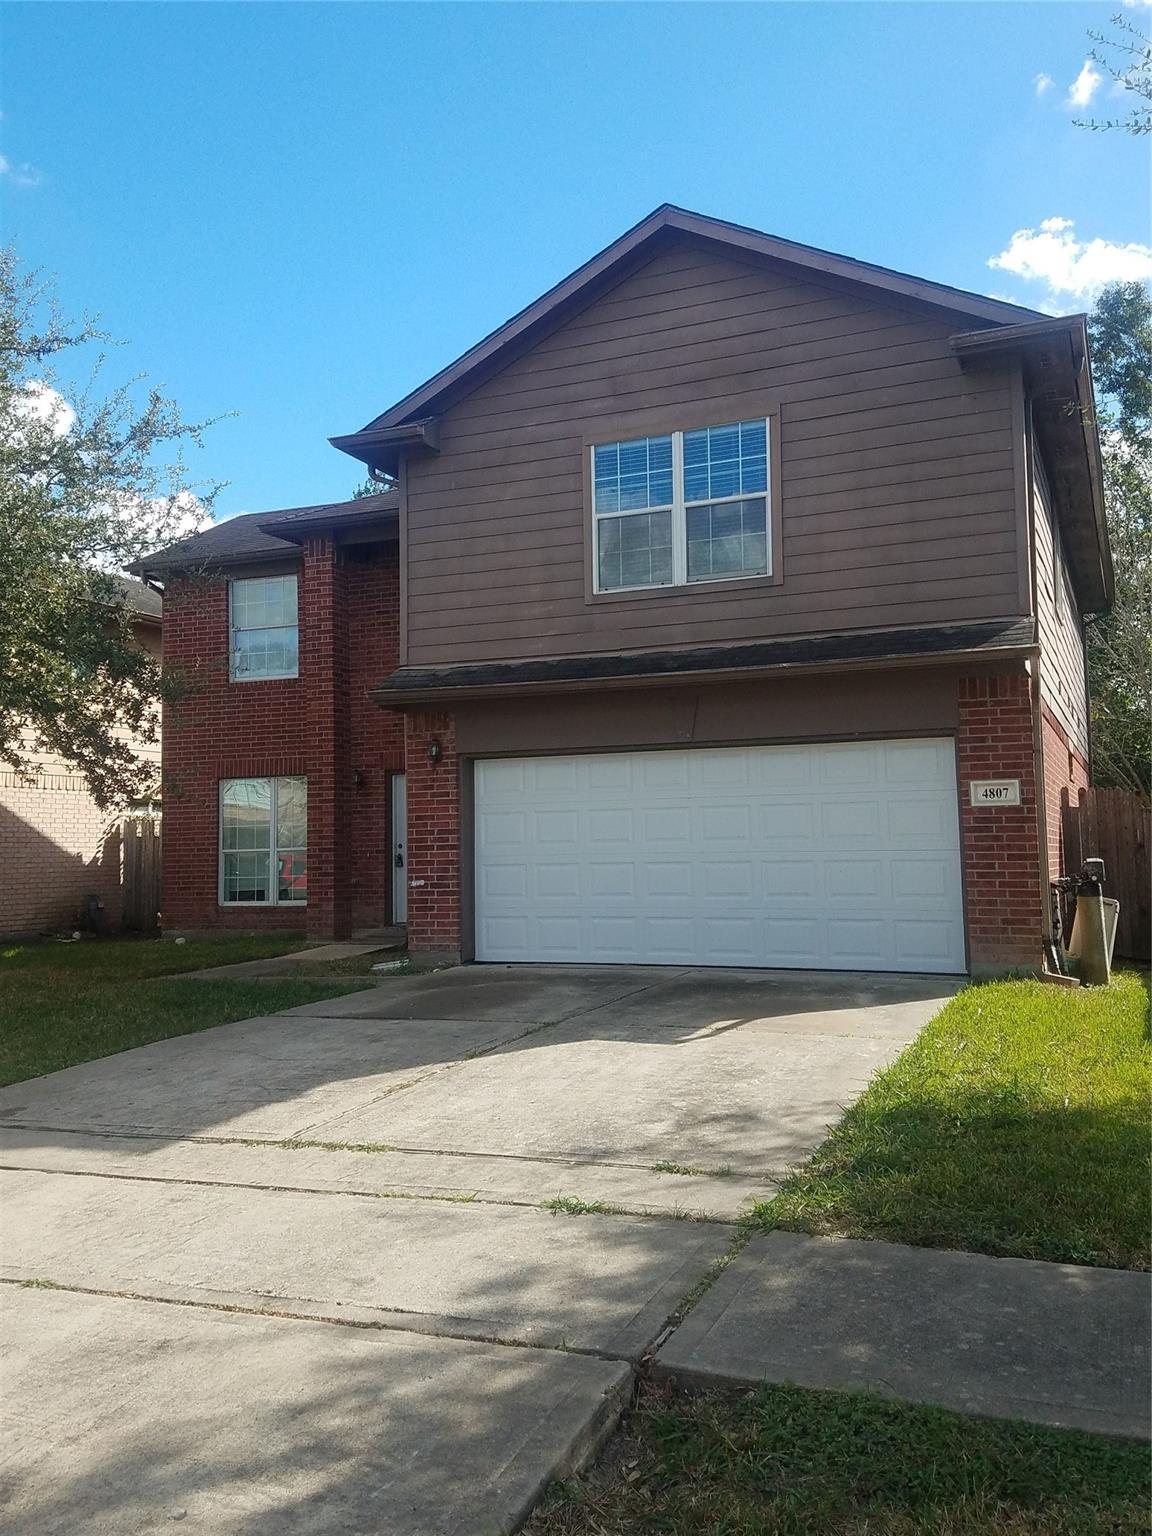 4807 Bryant Ridge Road Property Photo - Houston, TX real estate listing